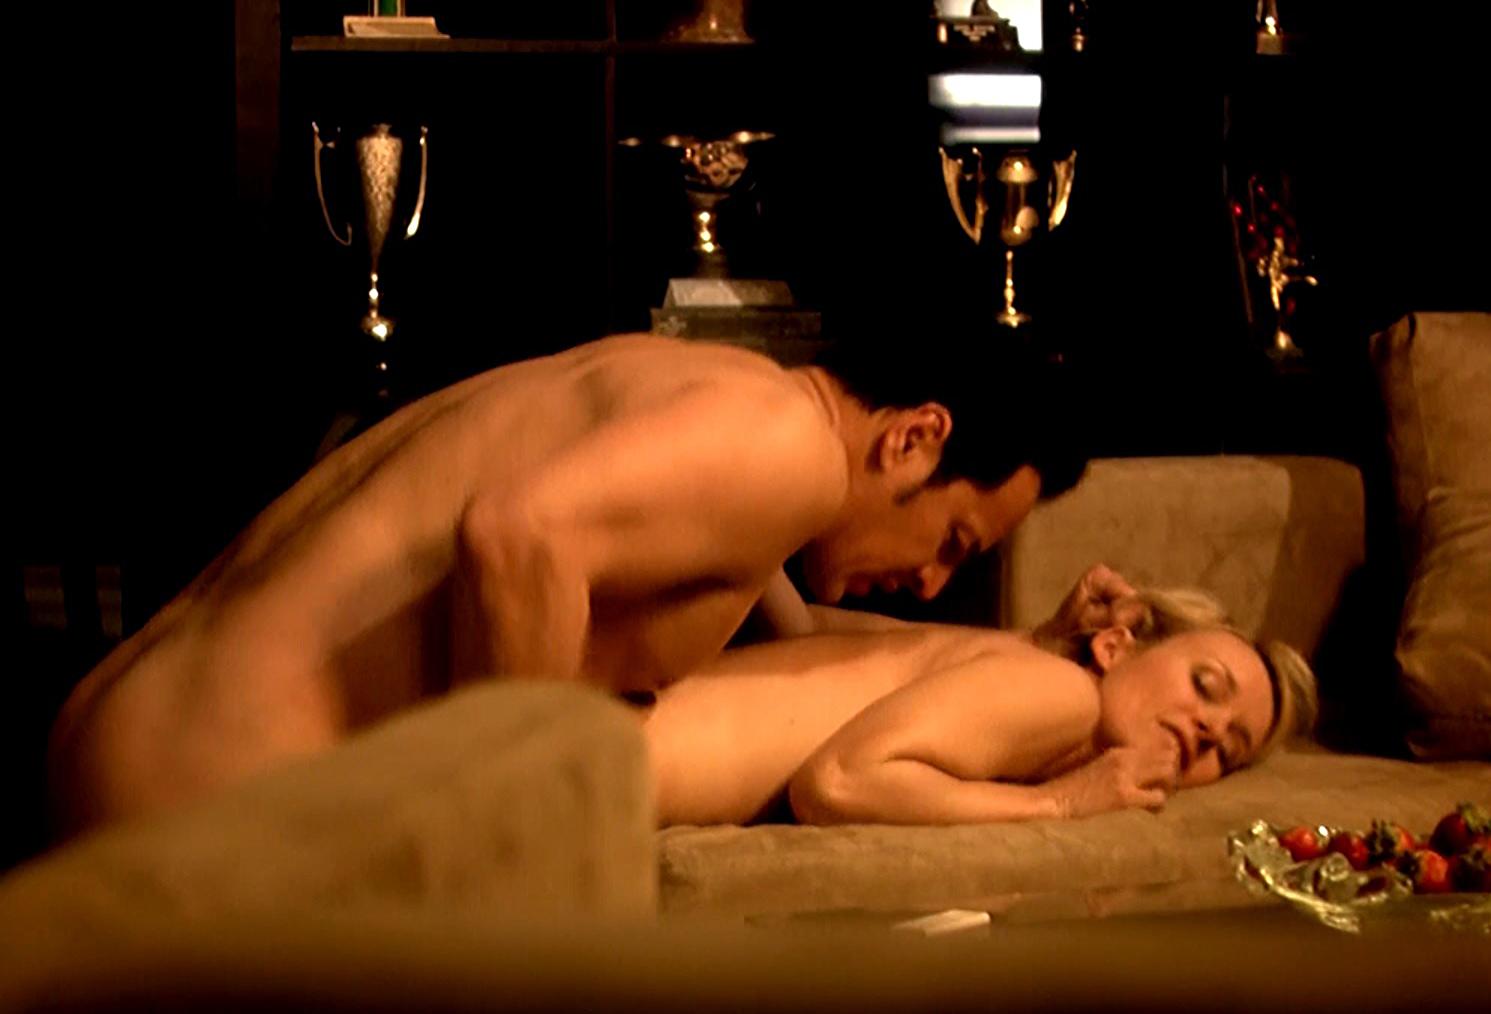 Mahima chaudhary nude and showing